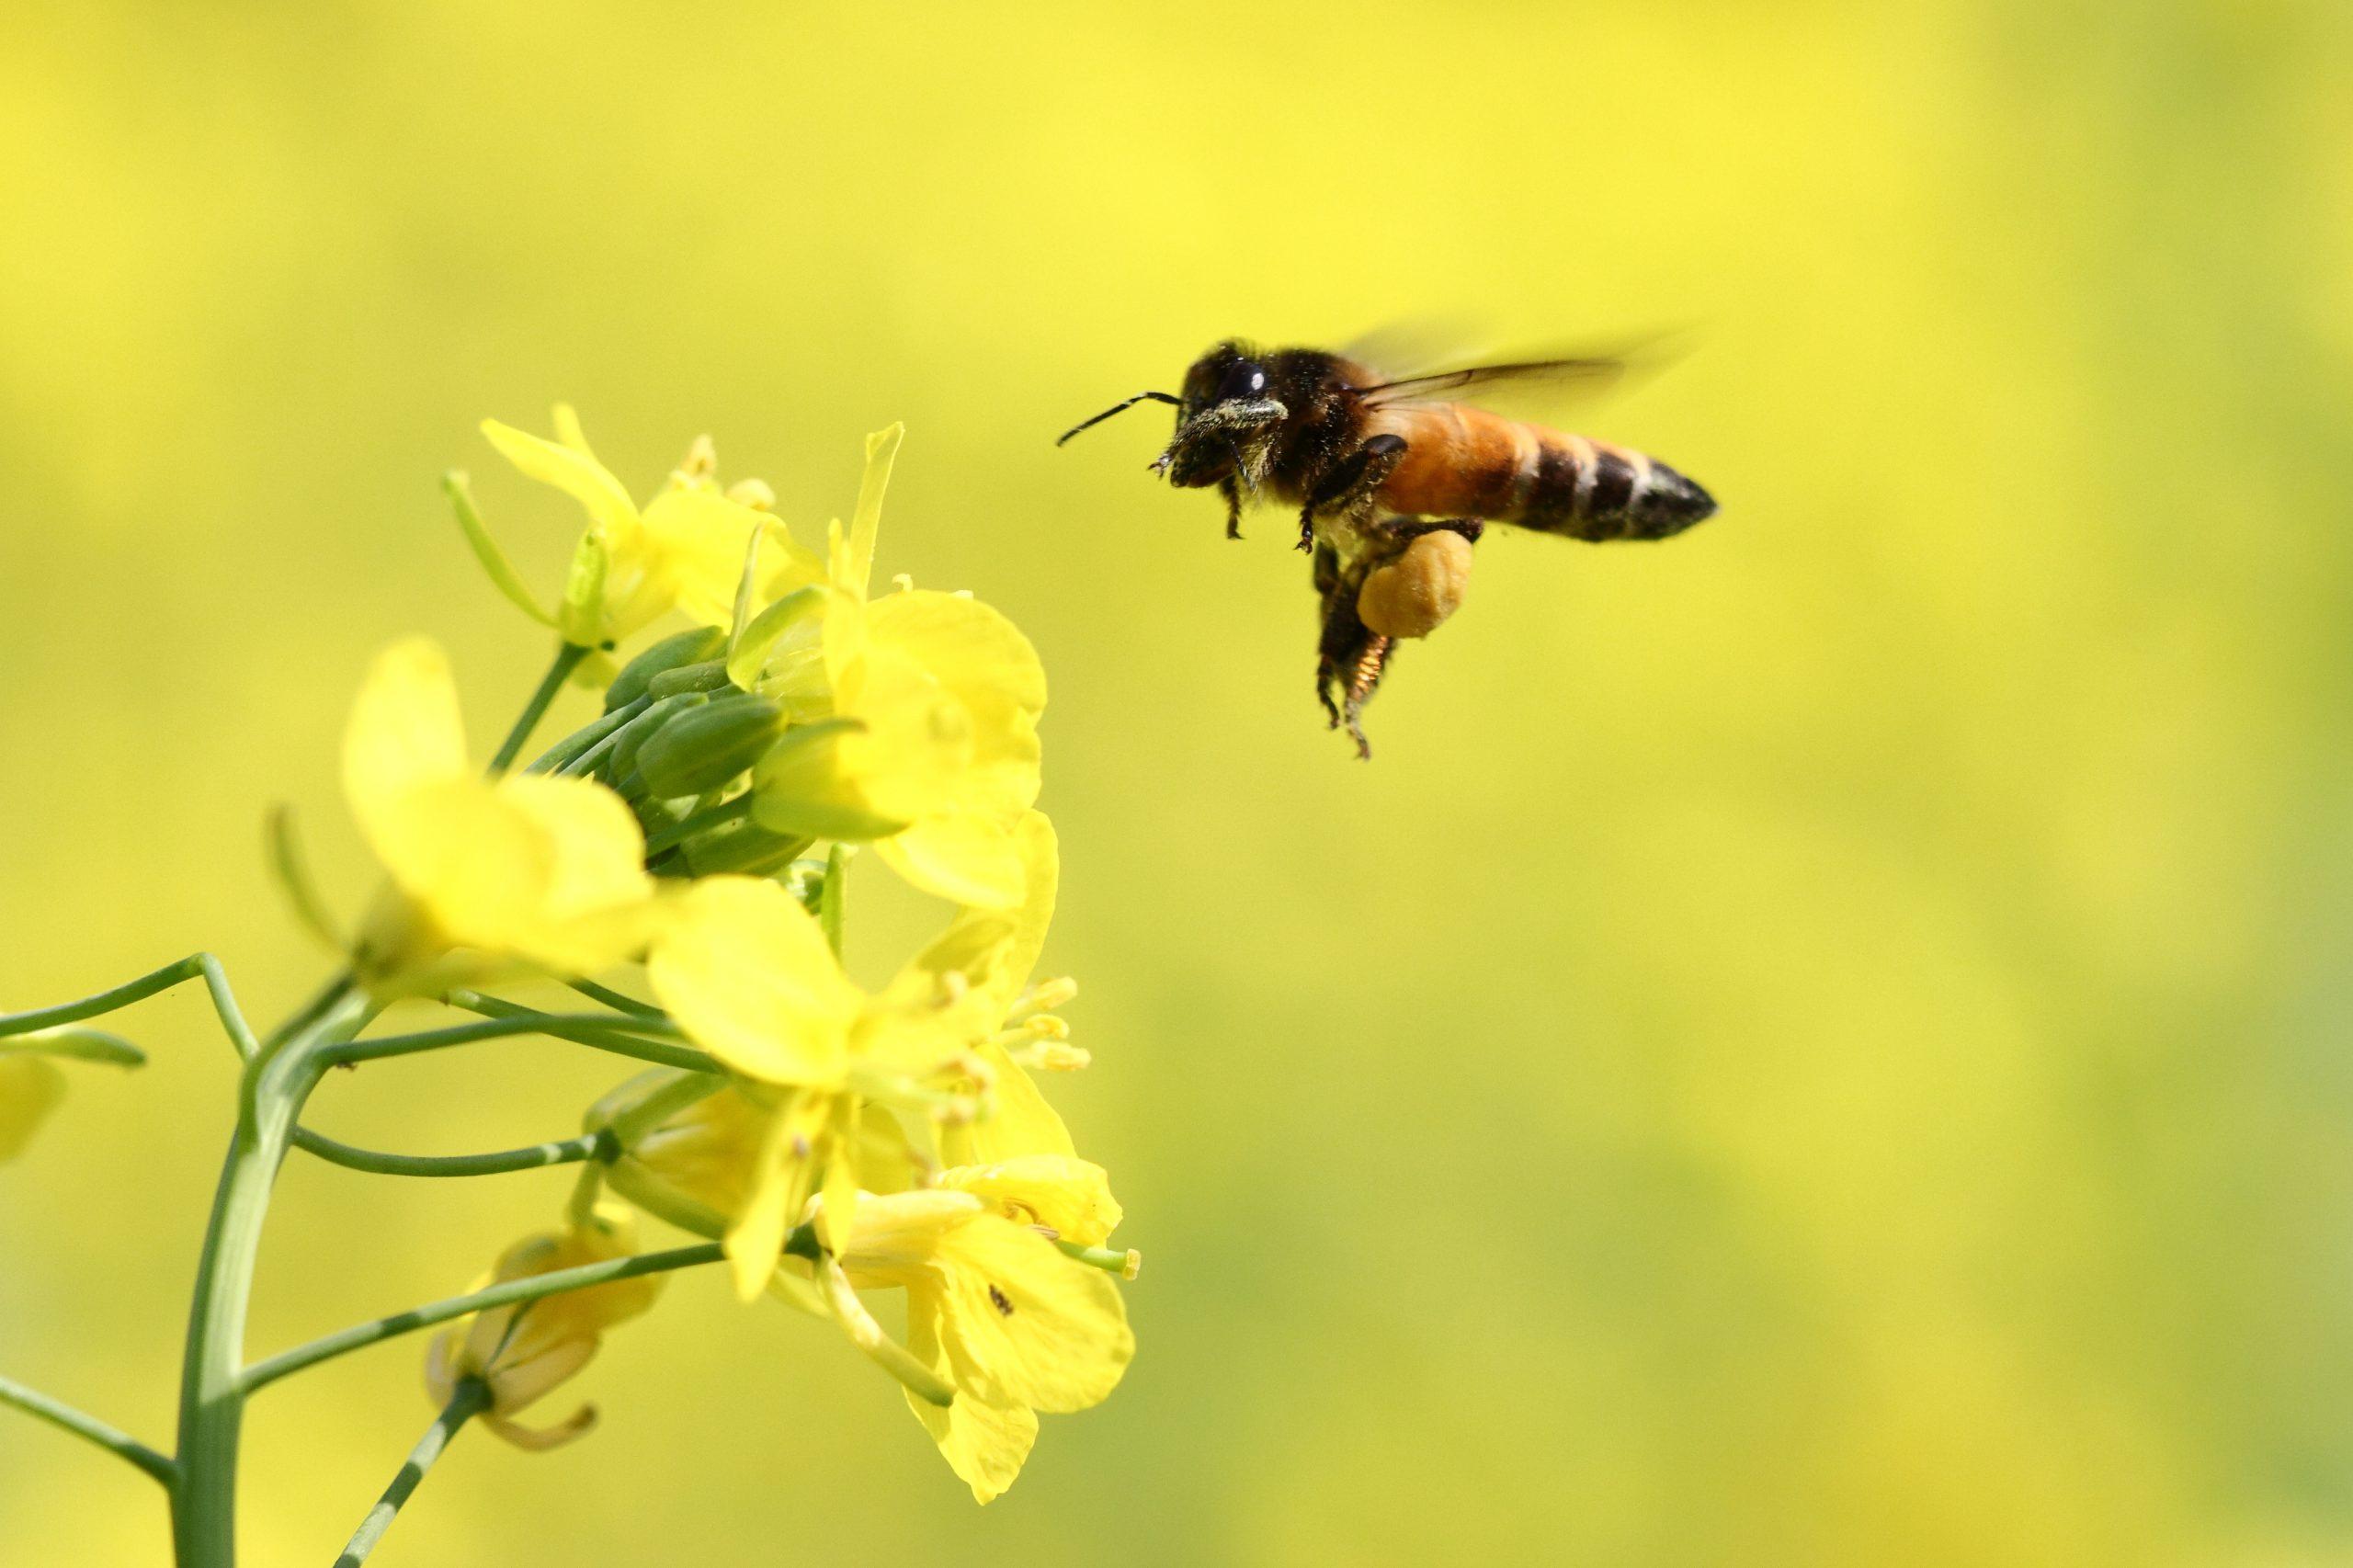 Honey bee hovering around flowers